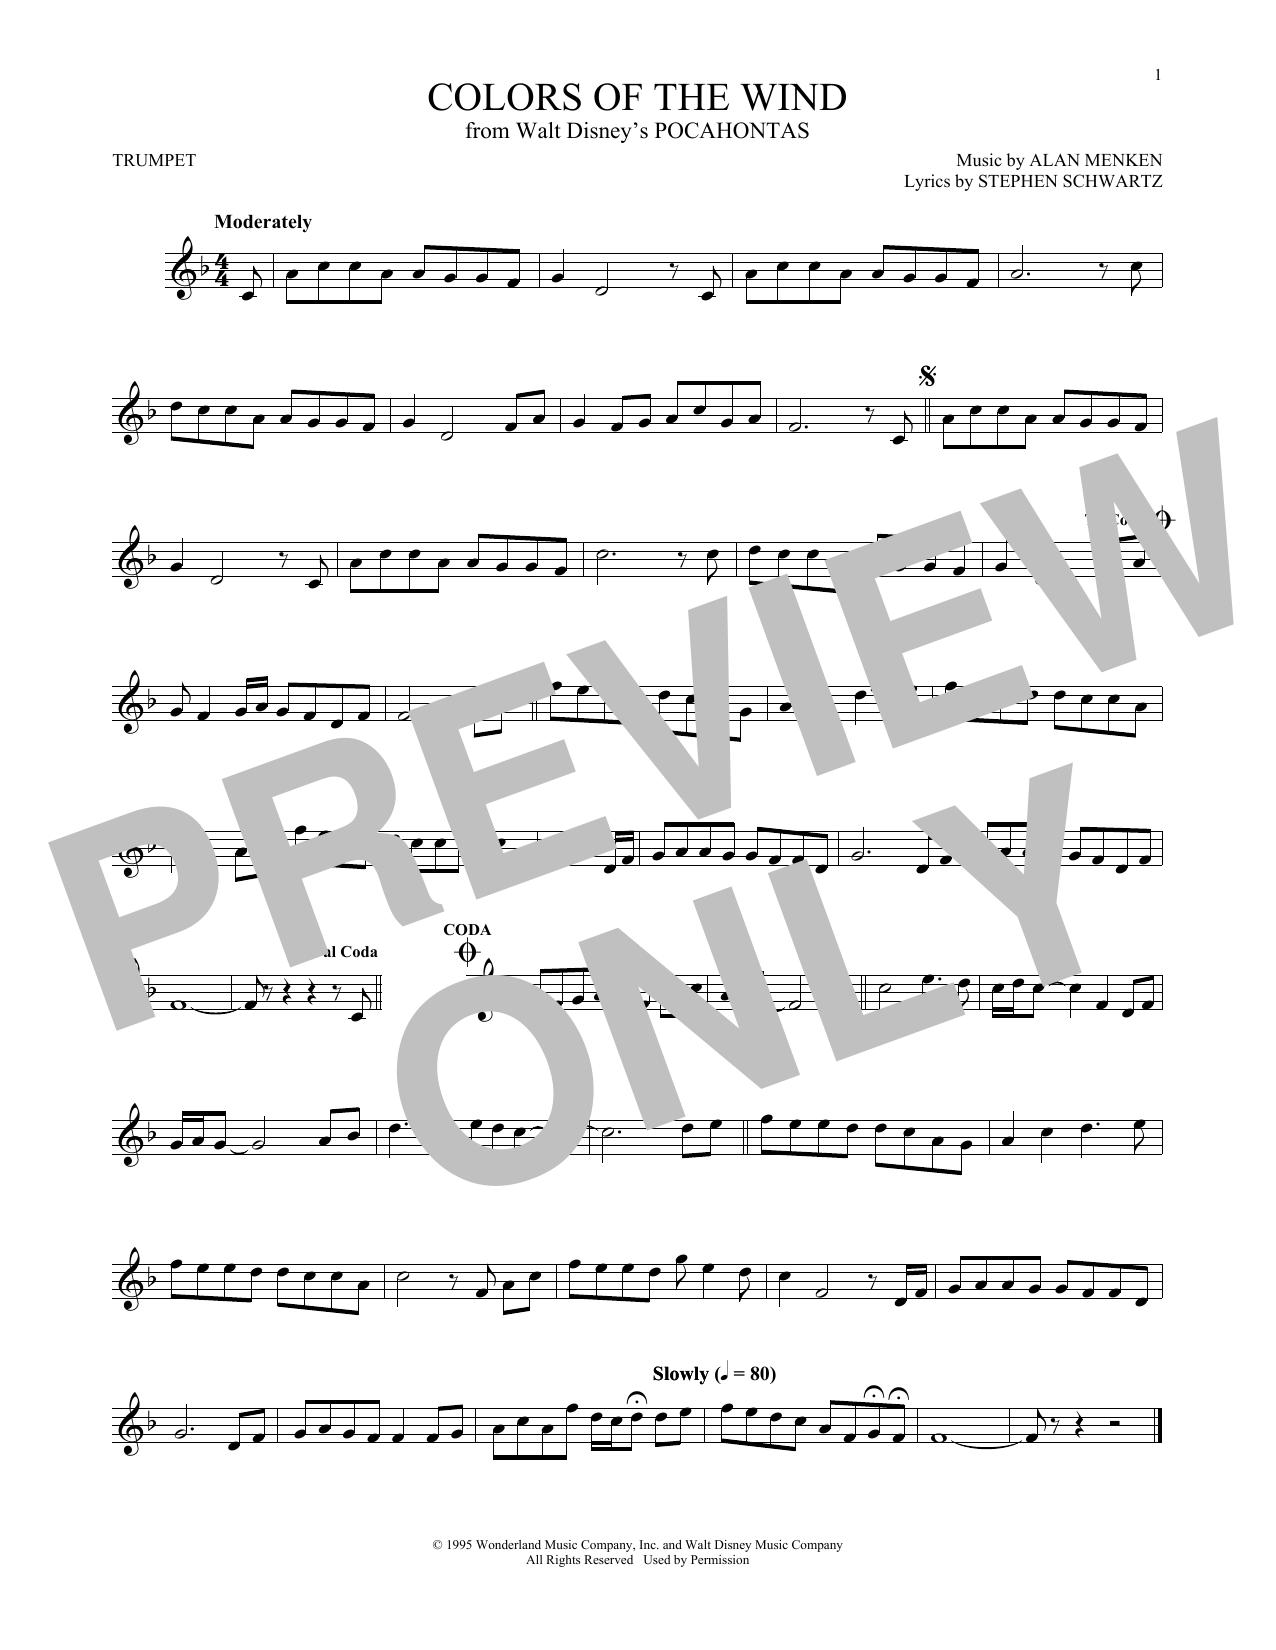 Sheet Music Digital Files To Print Licensed Stephen Schwartz